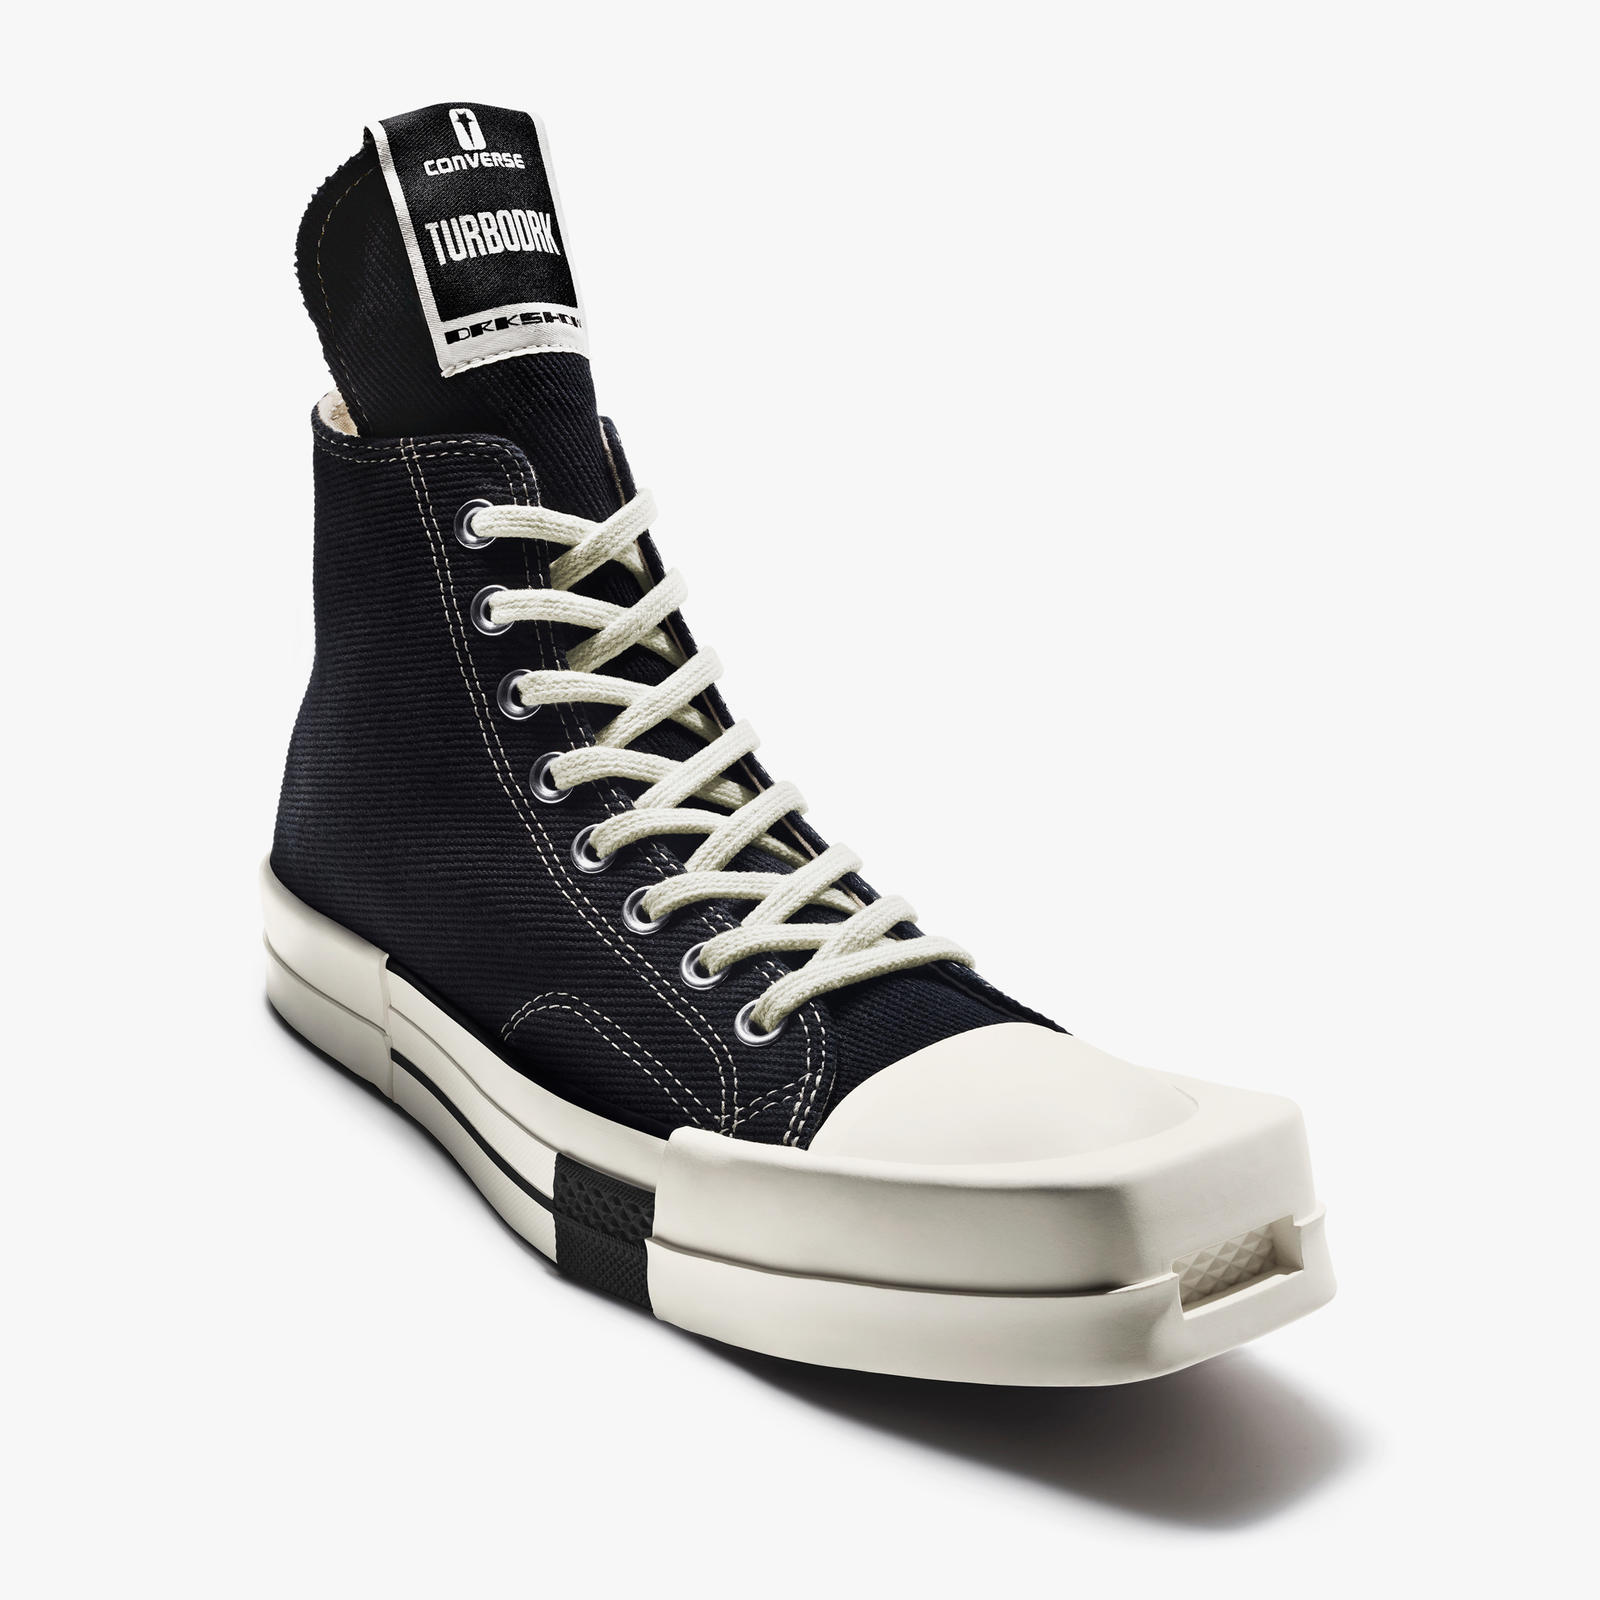 Converse x Rick Owens TURBODRK Chuck 70 - Nike News